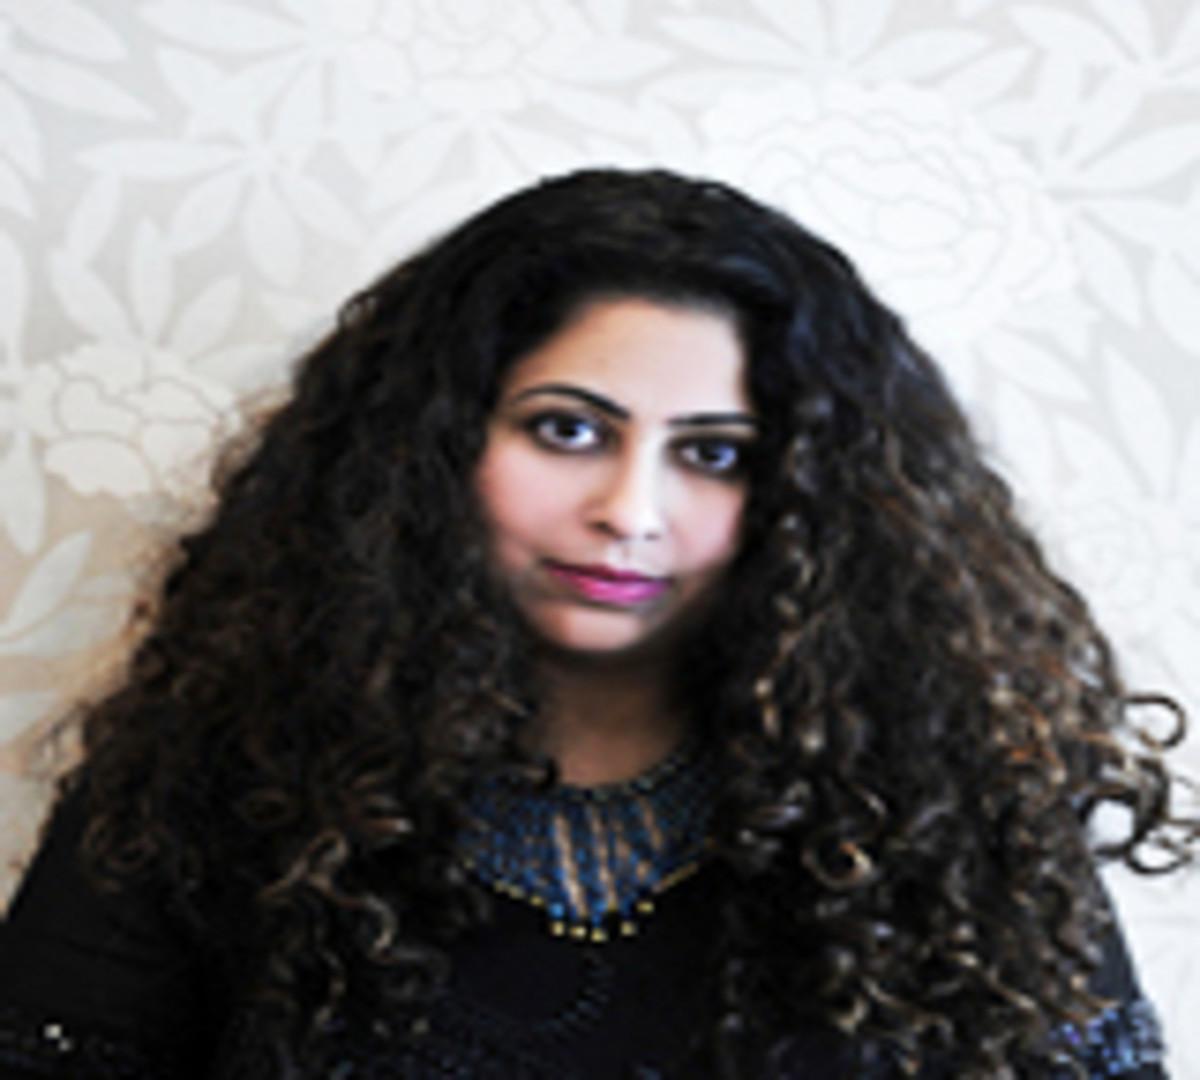 Anita Nair: The Cartographer of Fragmented Consciences